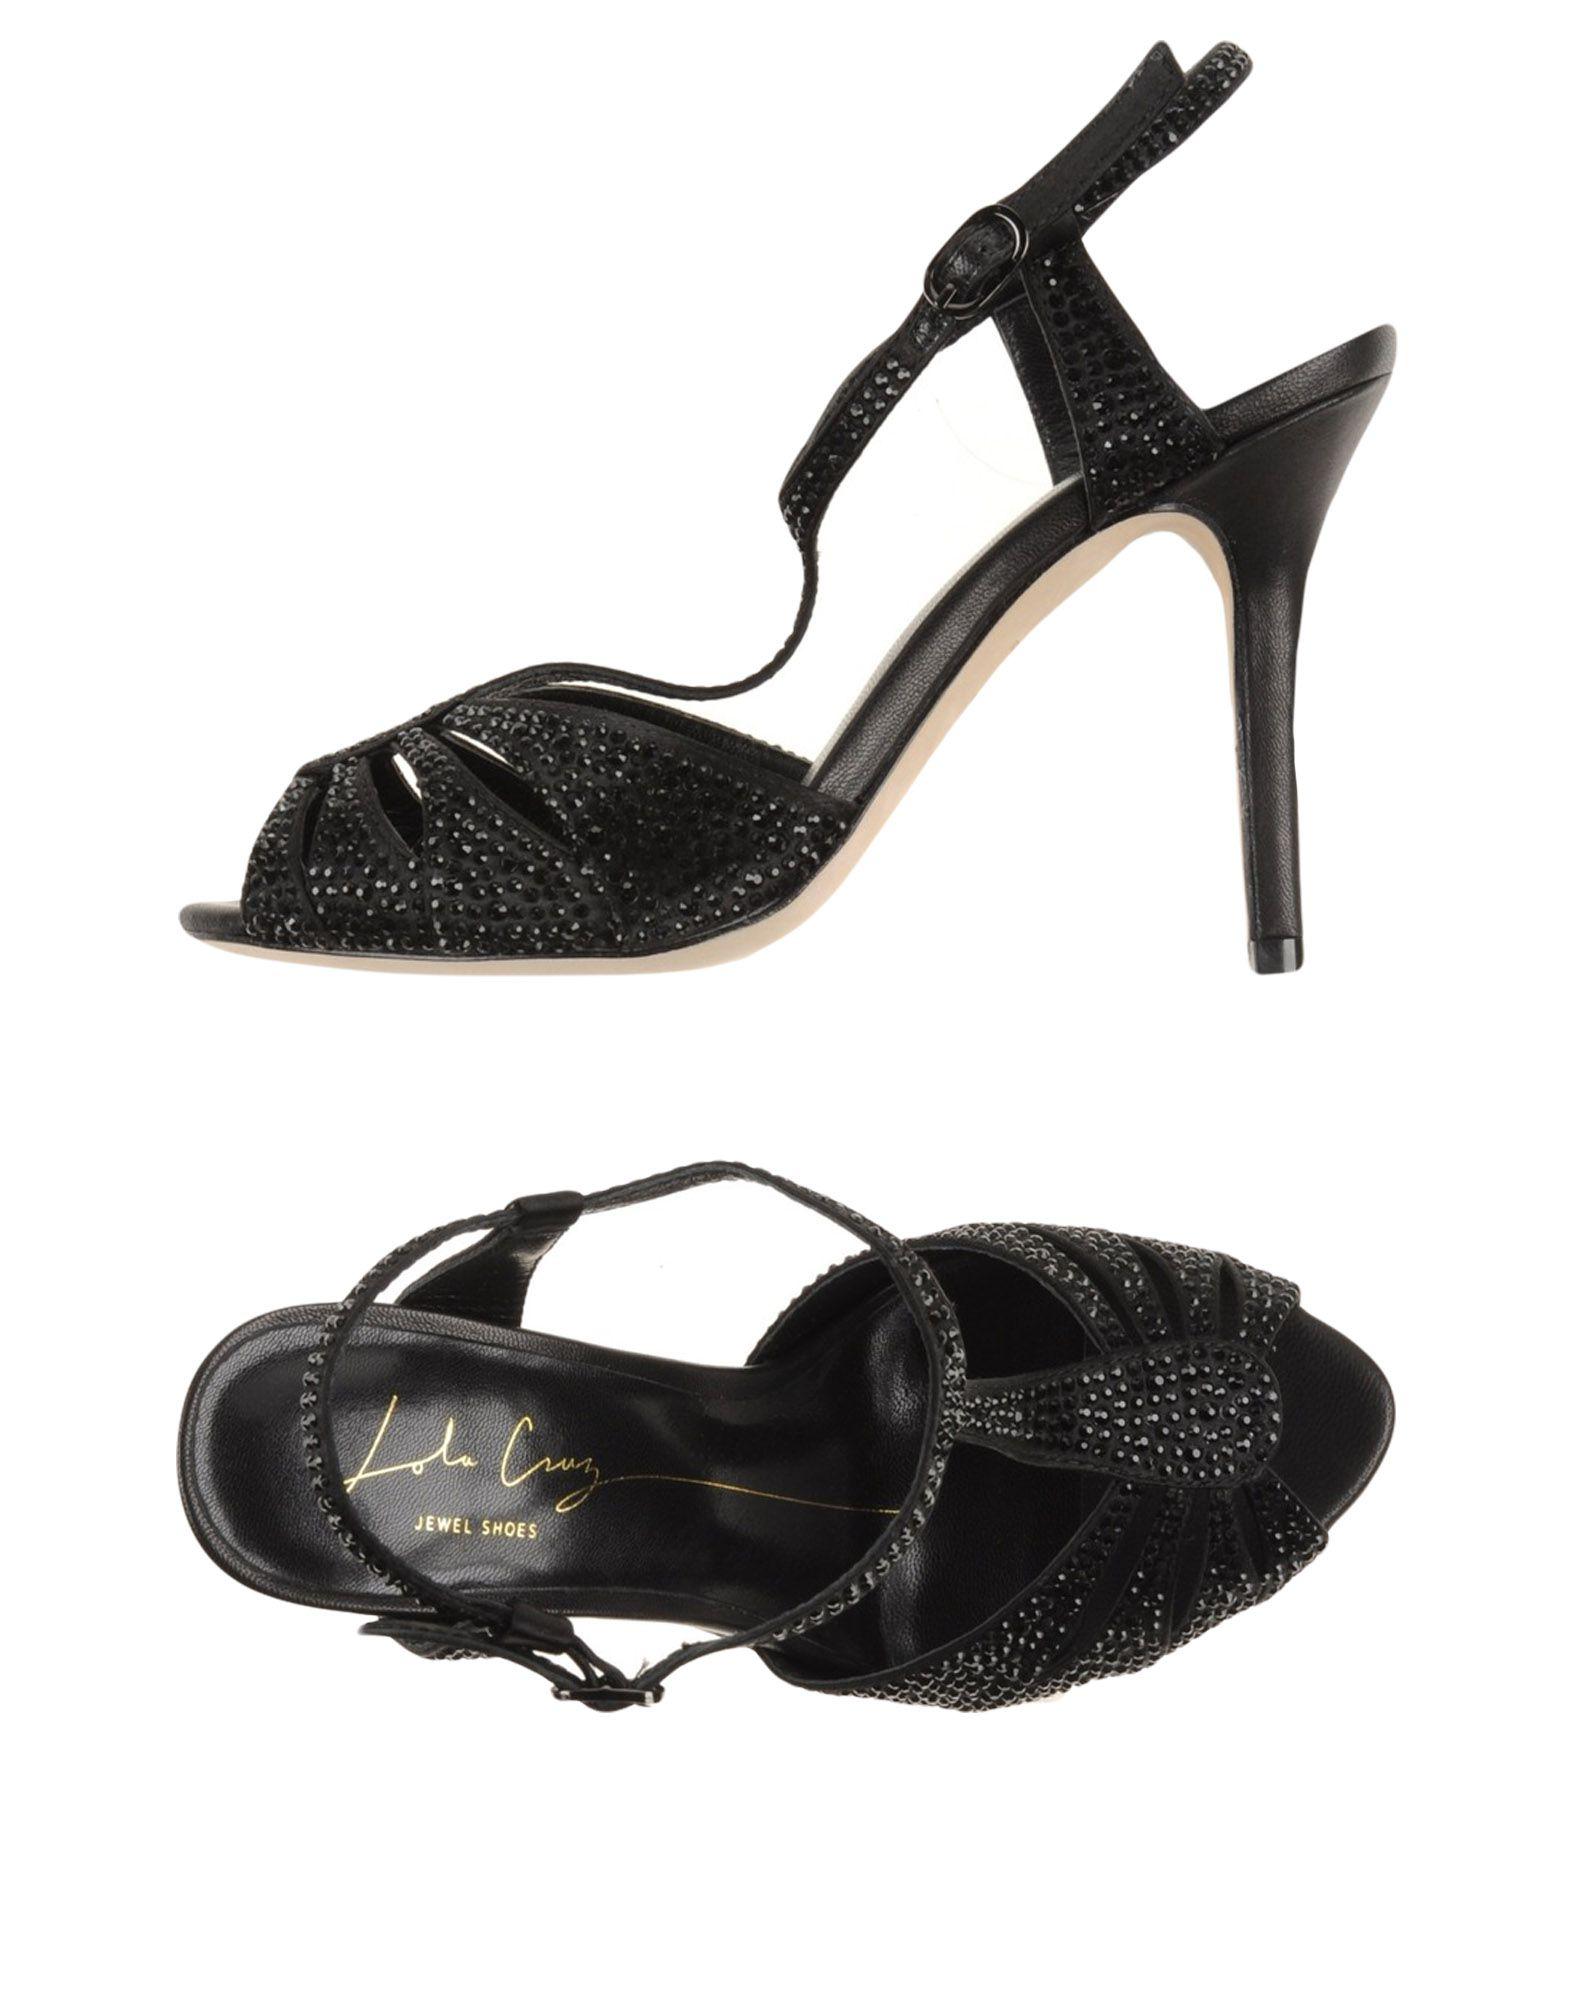 Lola Cruz Sandalen Damen 44915979MJ  44915979MJ Damen Gute Qualität beliebte Schuhe b4feee